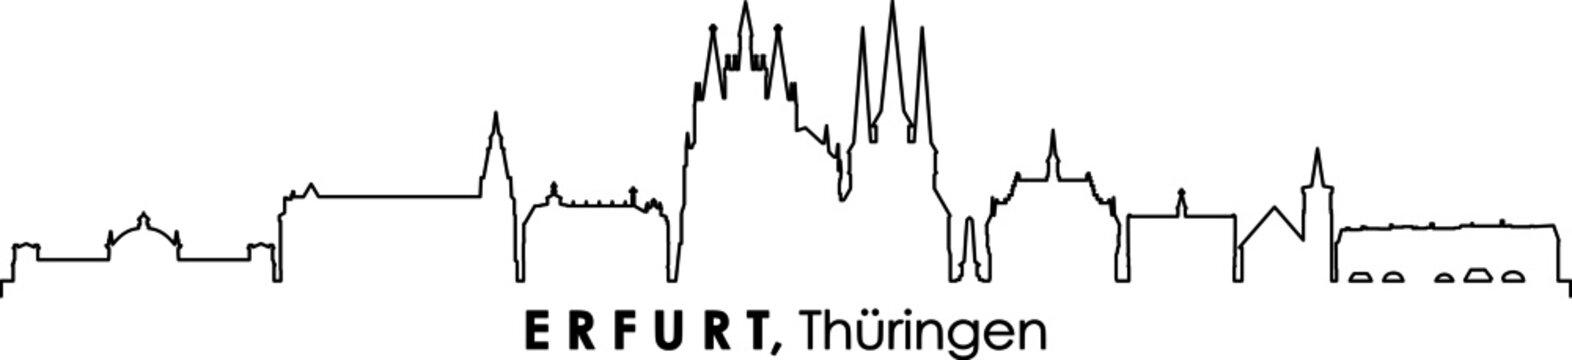 ERFURT Thüringen SKYLINE City Silhouette